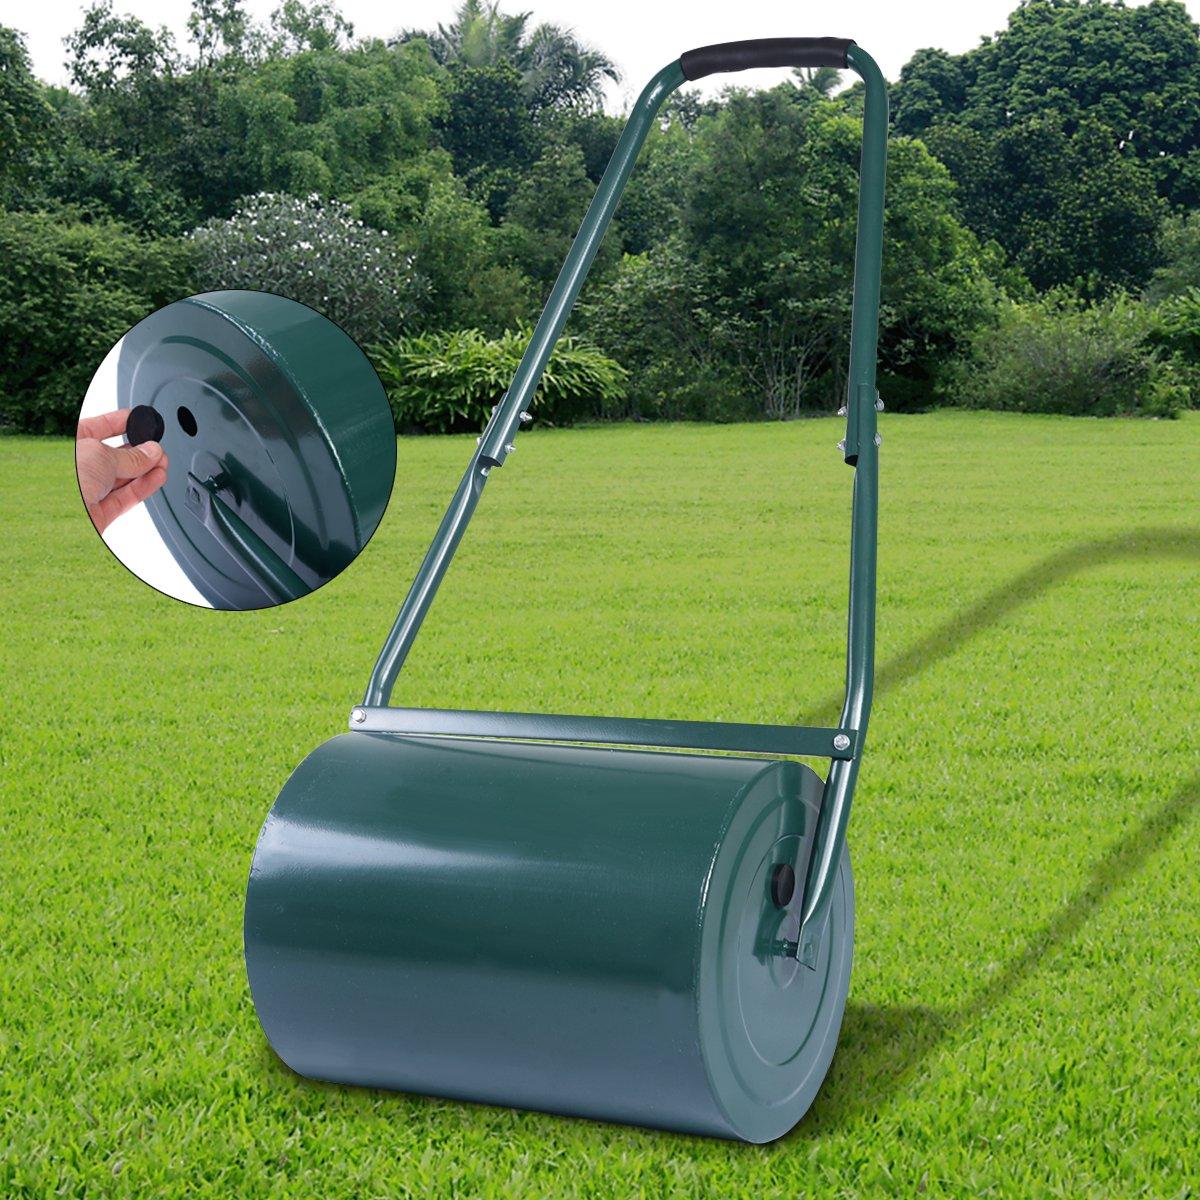 Costway Lawn Roller Heavy Duty Garden Steel Water or Sand Filled 30 Litre Garden for Grass